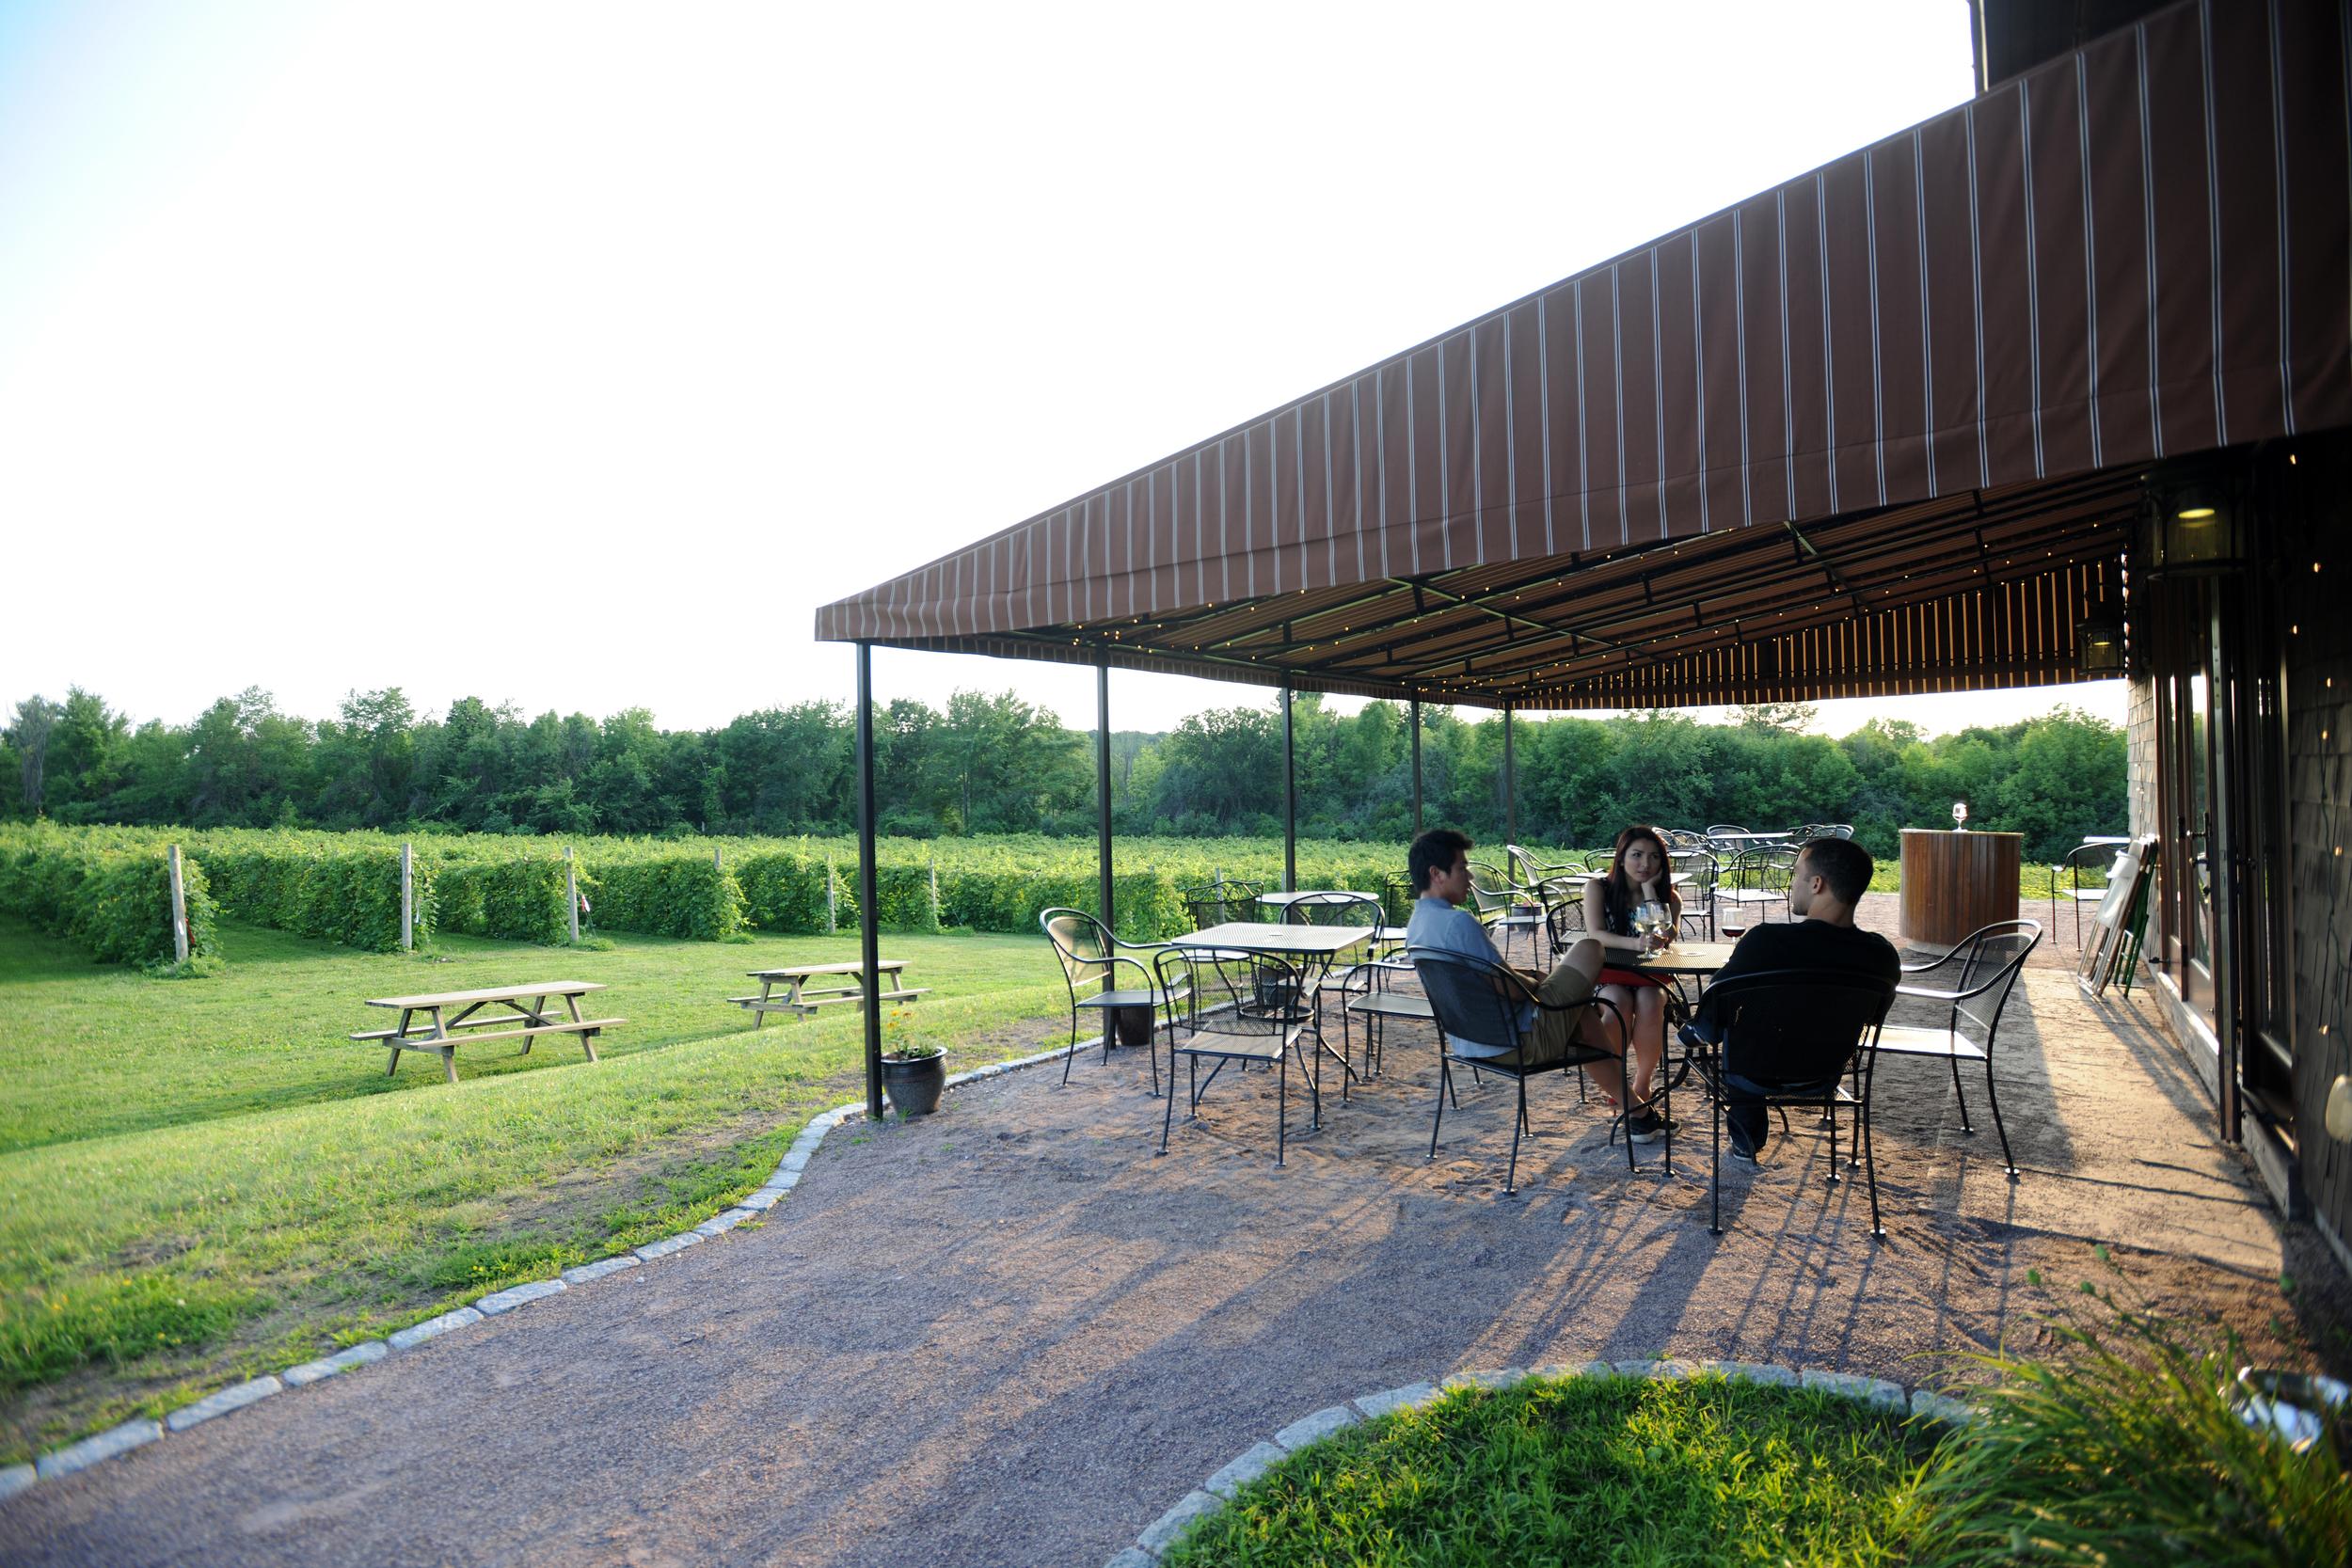 View of vineyard and people enjoying patio